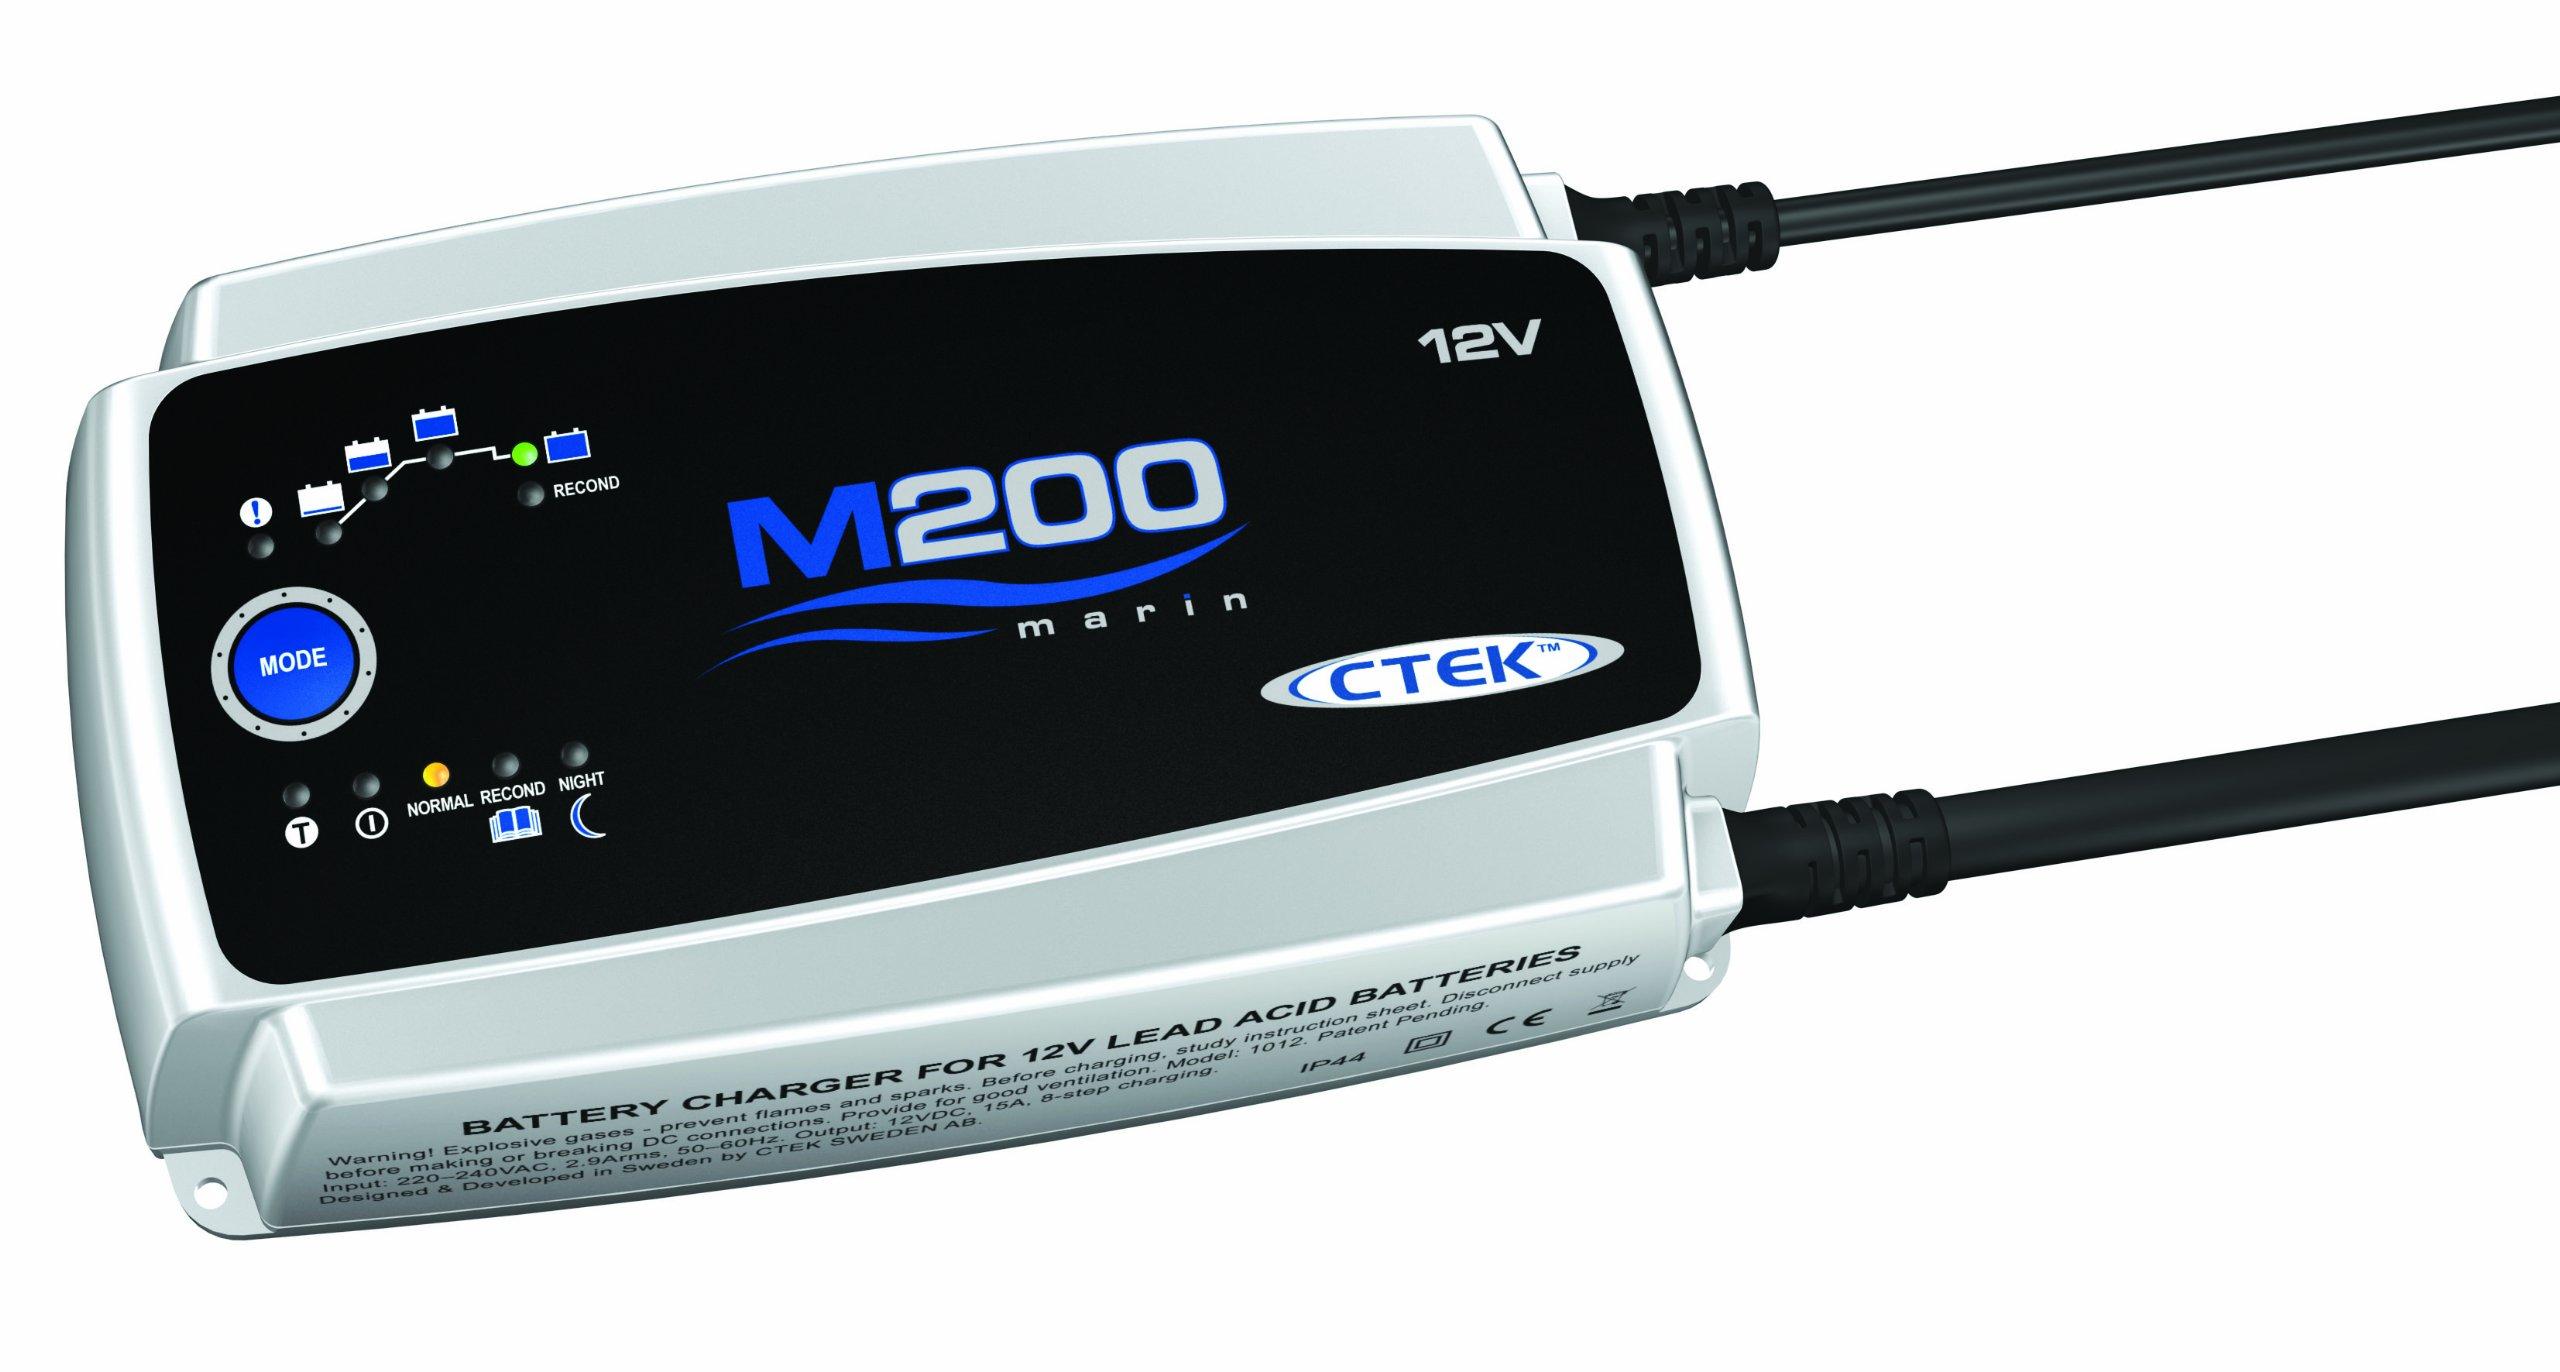 CTEK 56-220 Caricabatterie